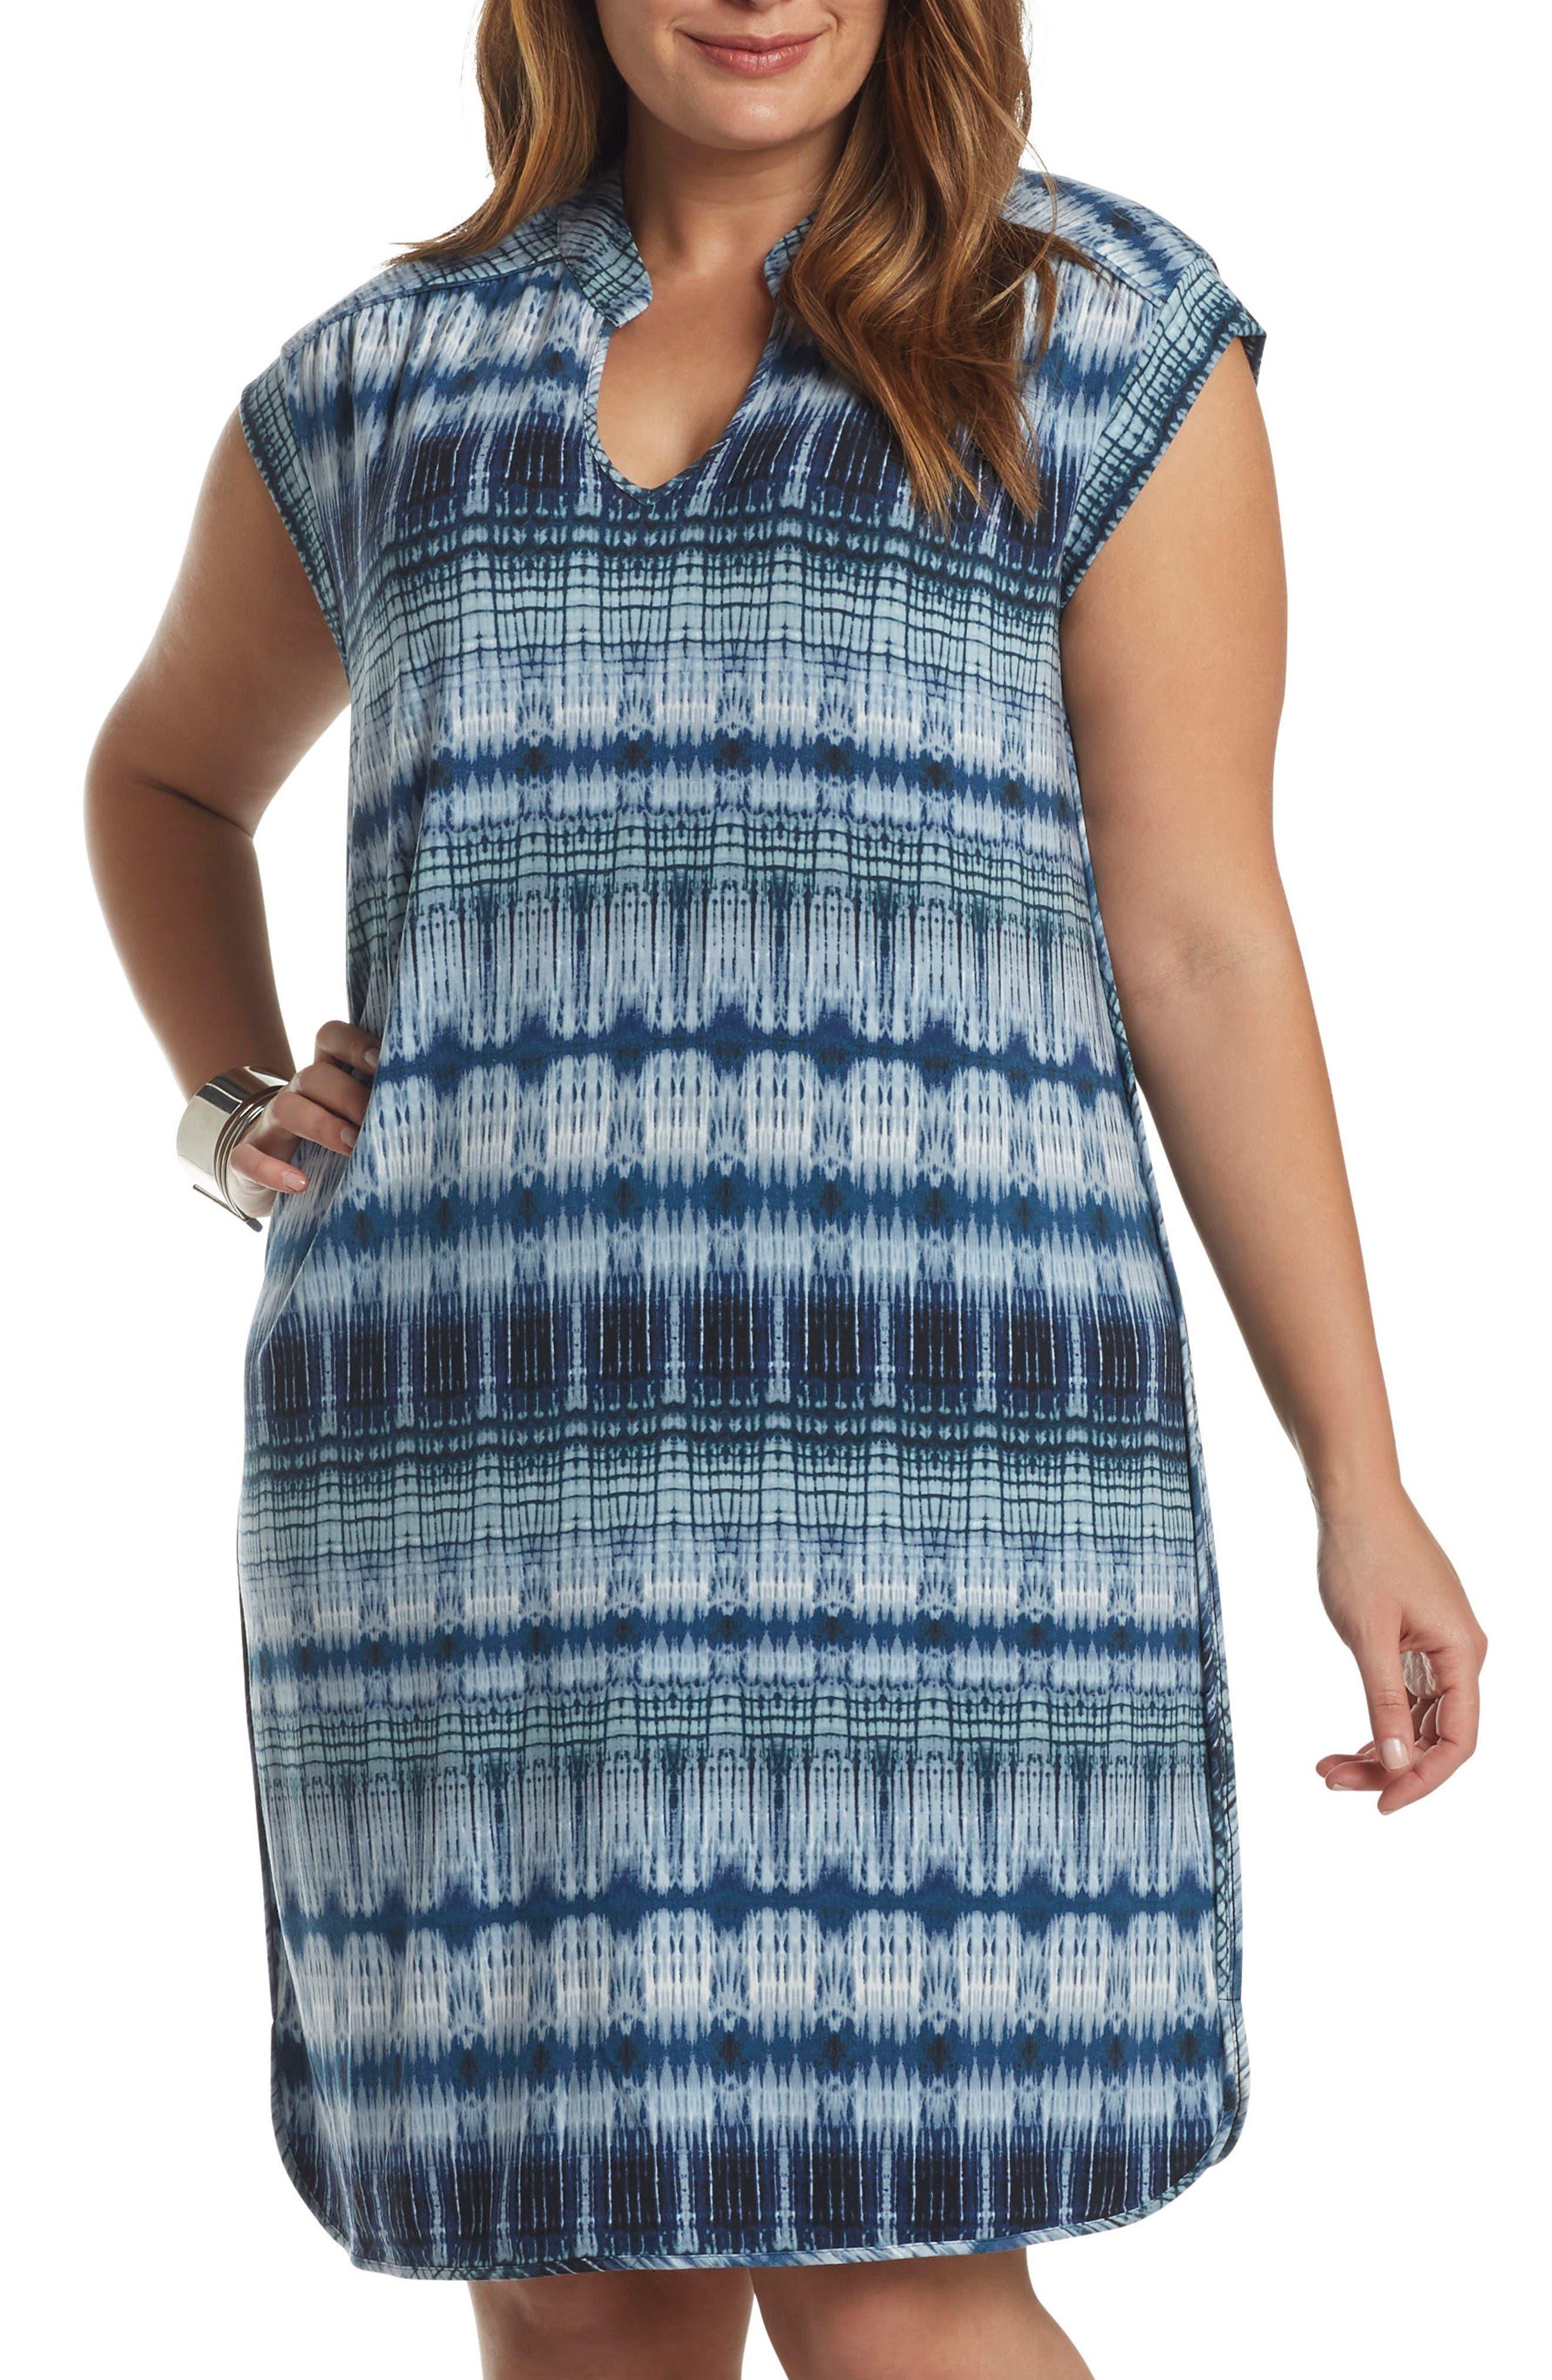 Tart 'Mellie' Split Neck Jersey Dress (Plus Size)